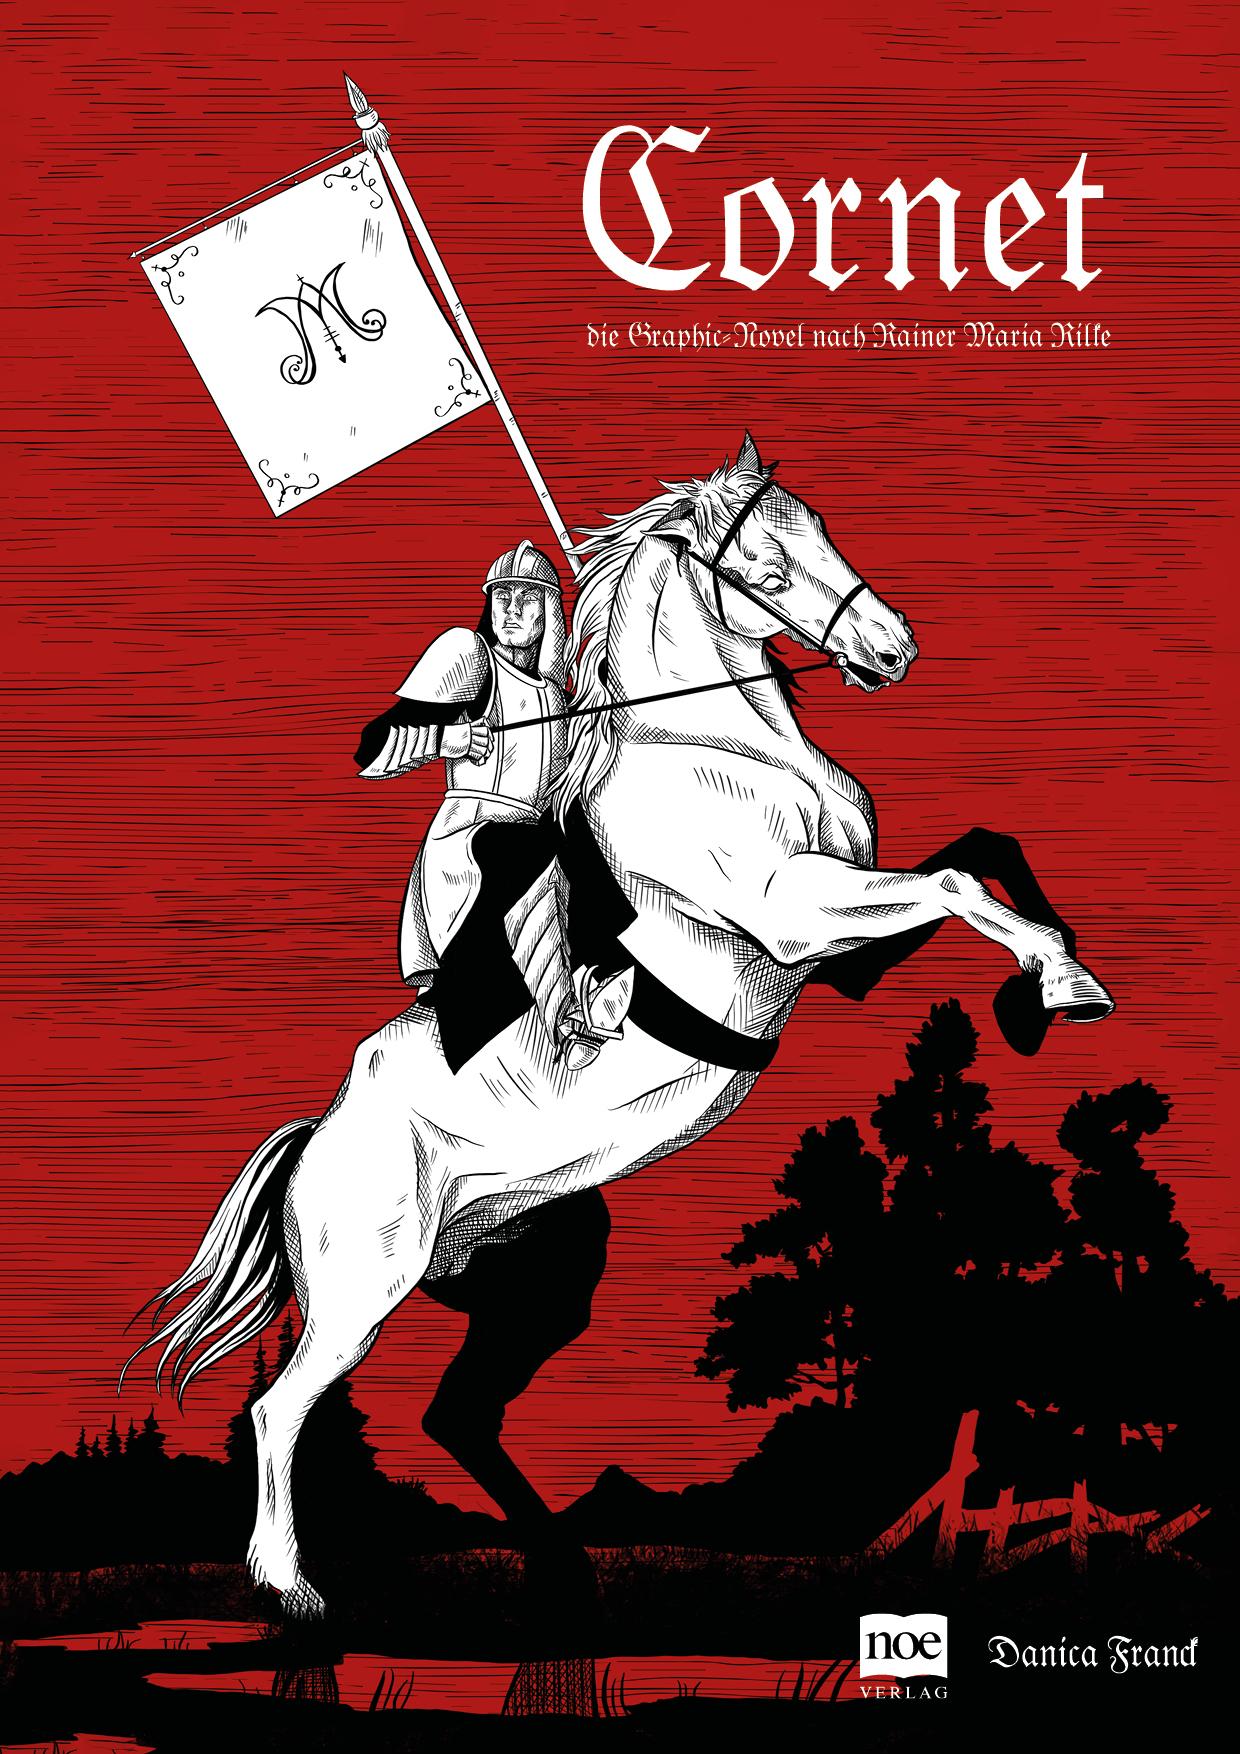 Cornet - Die Graphic Novel - Cover